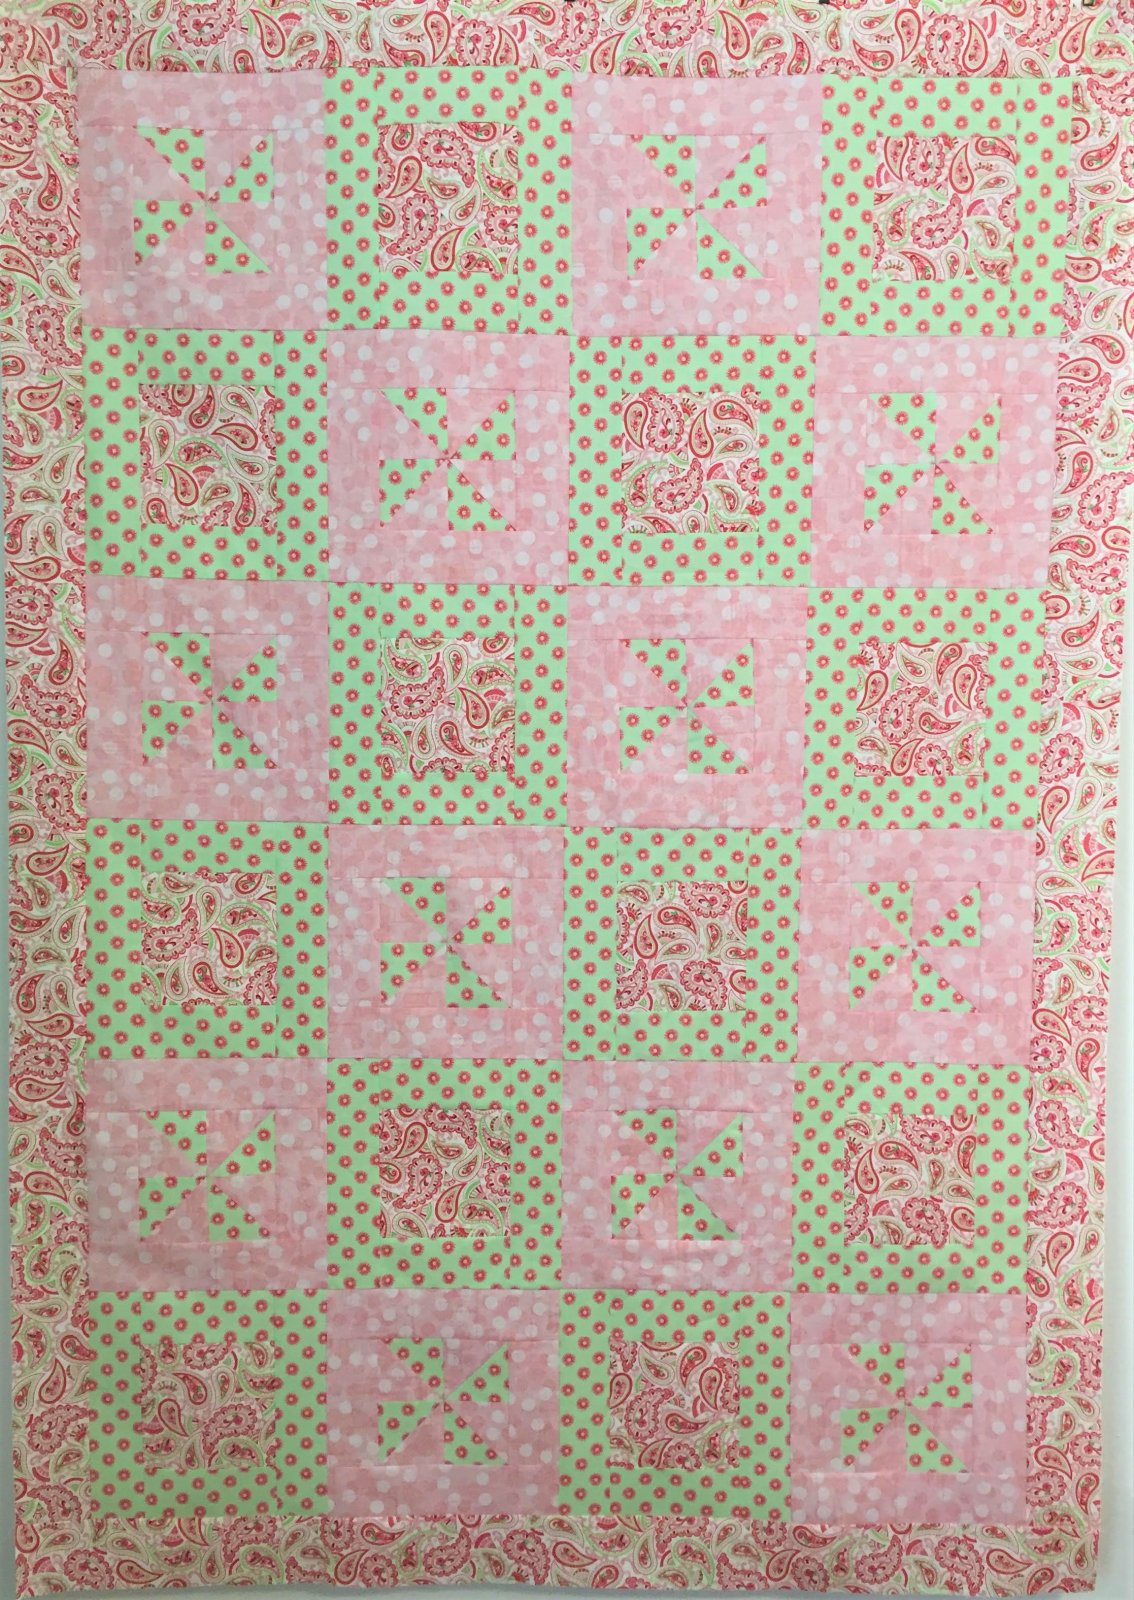 Pinwheel Party Quilt Top